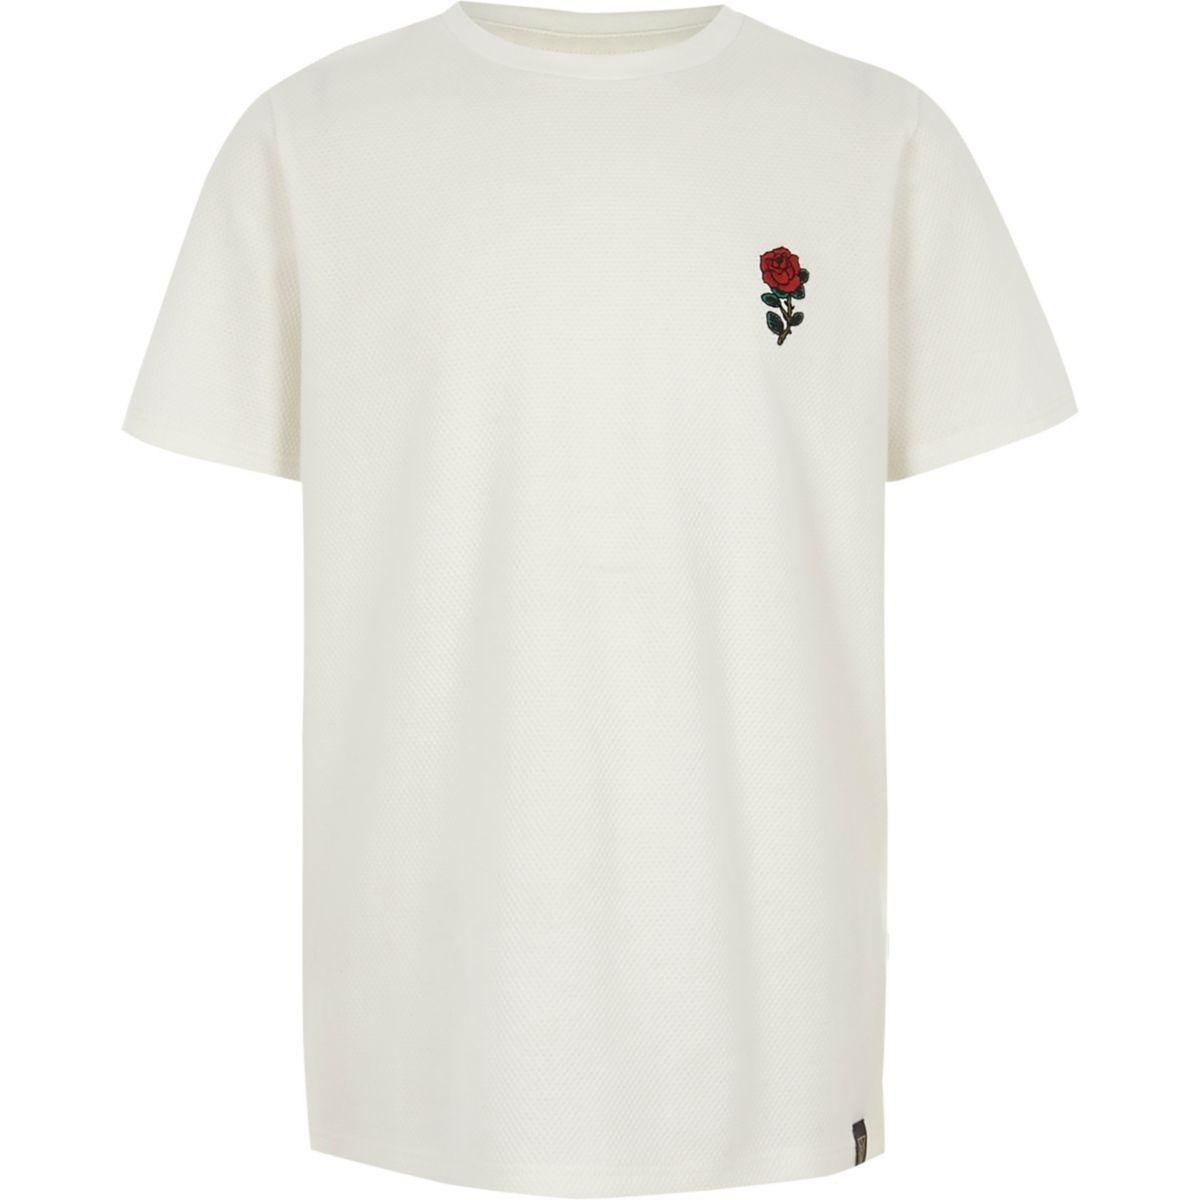 Boys white textured rose print T-shirt